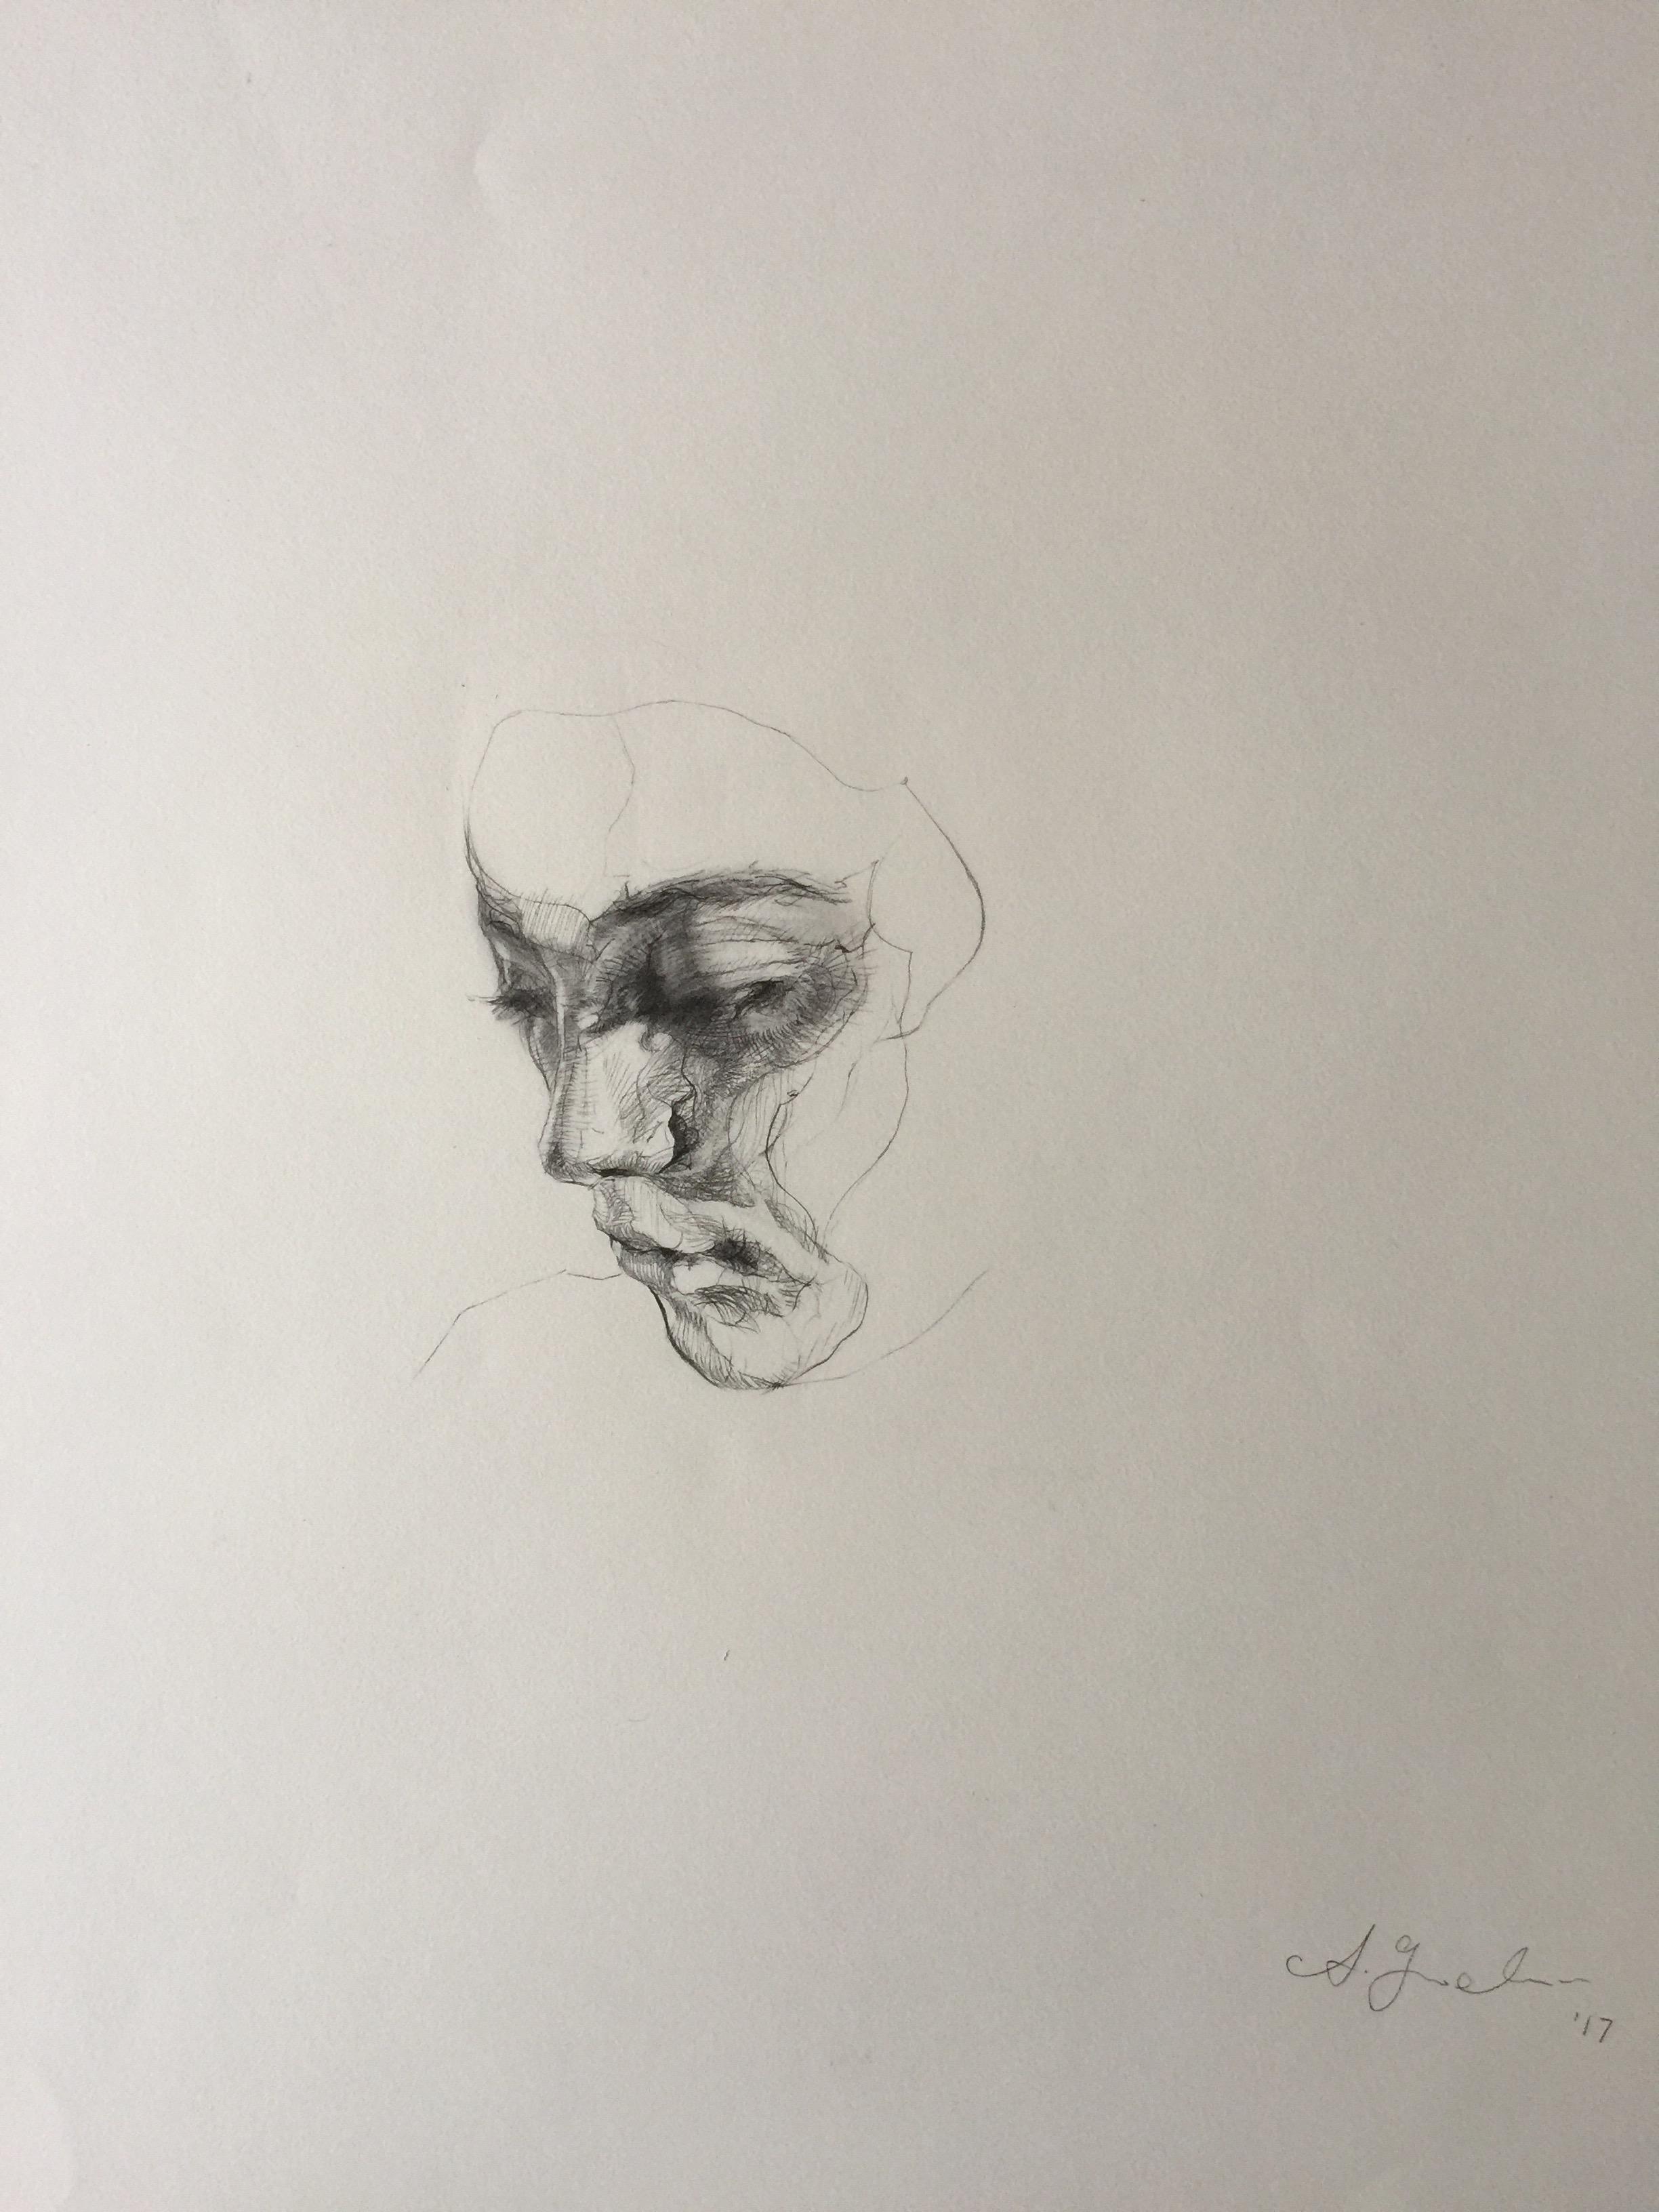 Agnes_Grochulska_Synthesis_Art Process:Bust_1_pencil_18x24.JPG